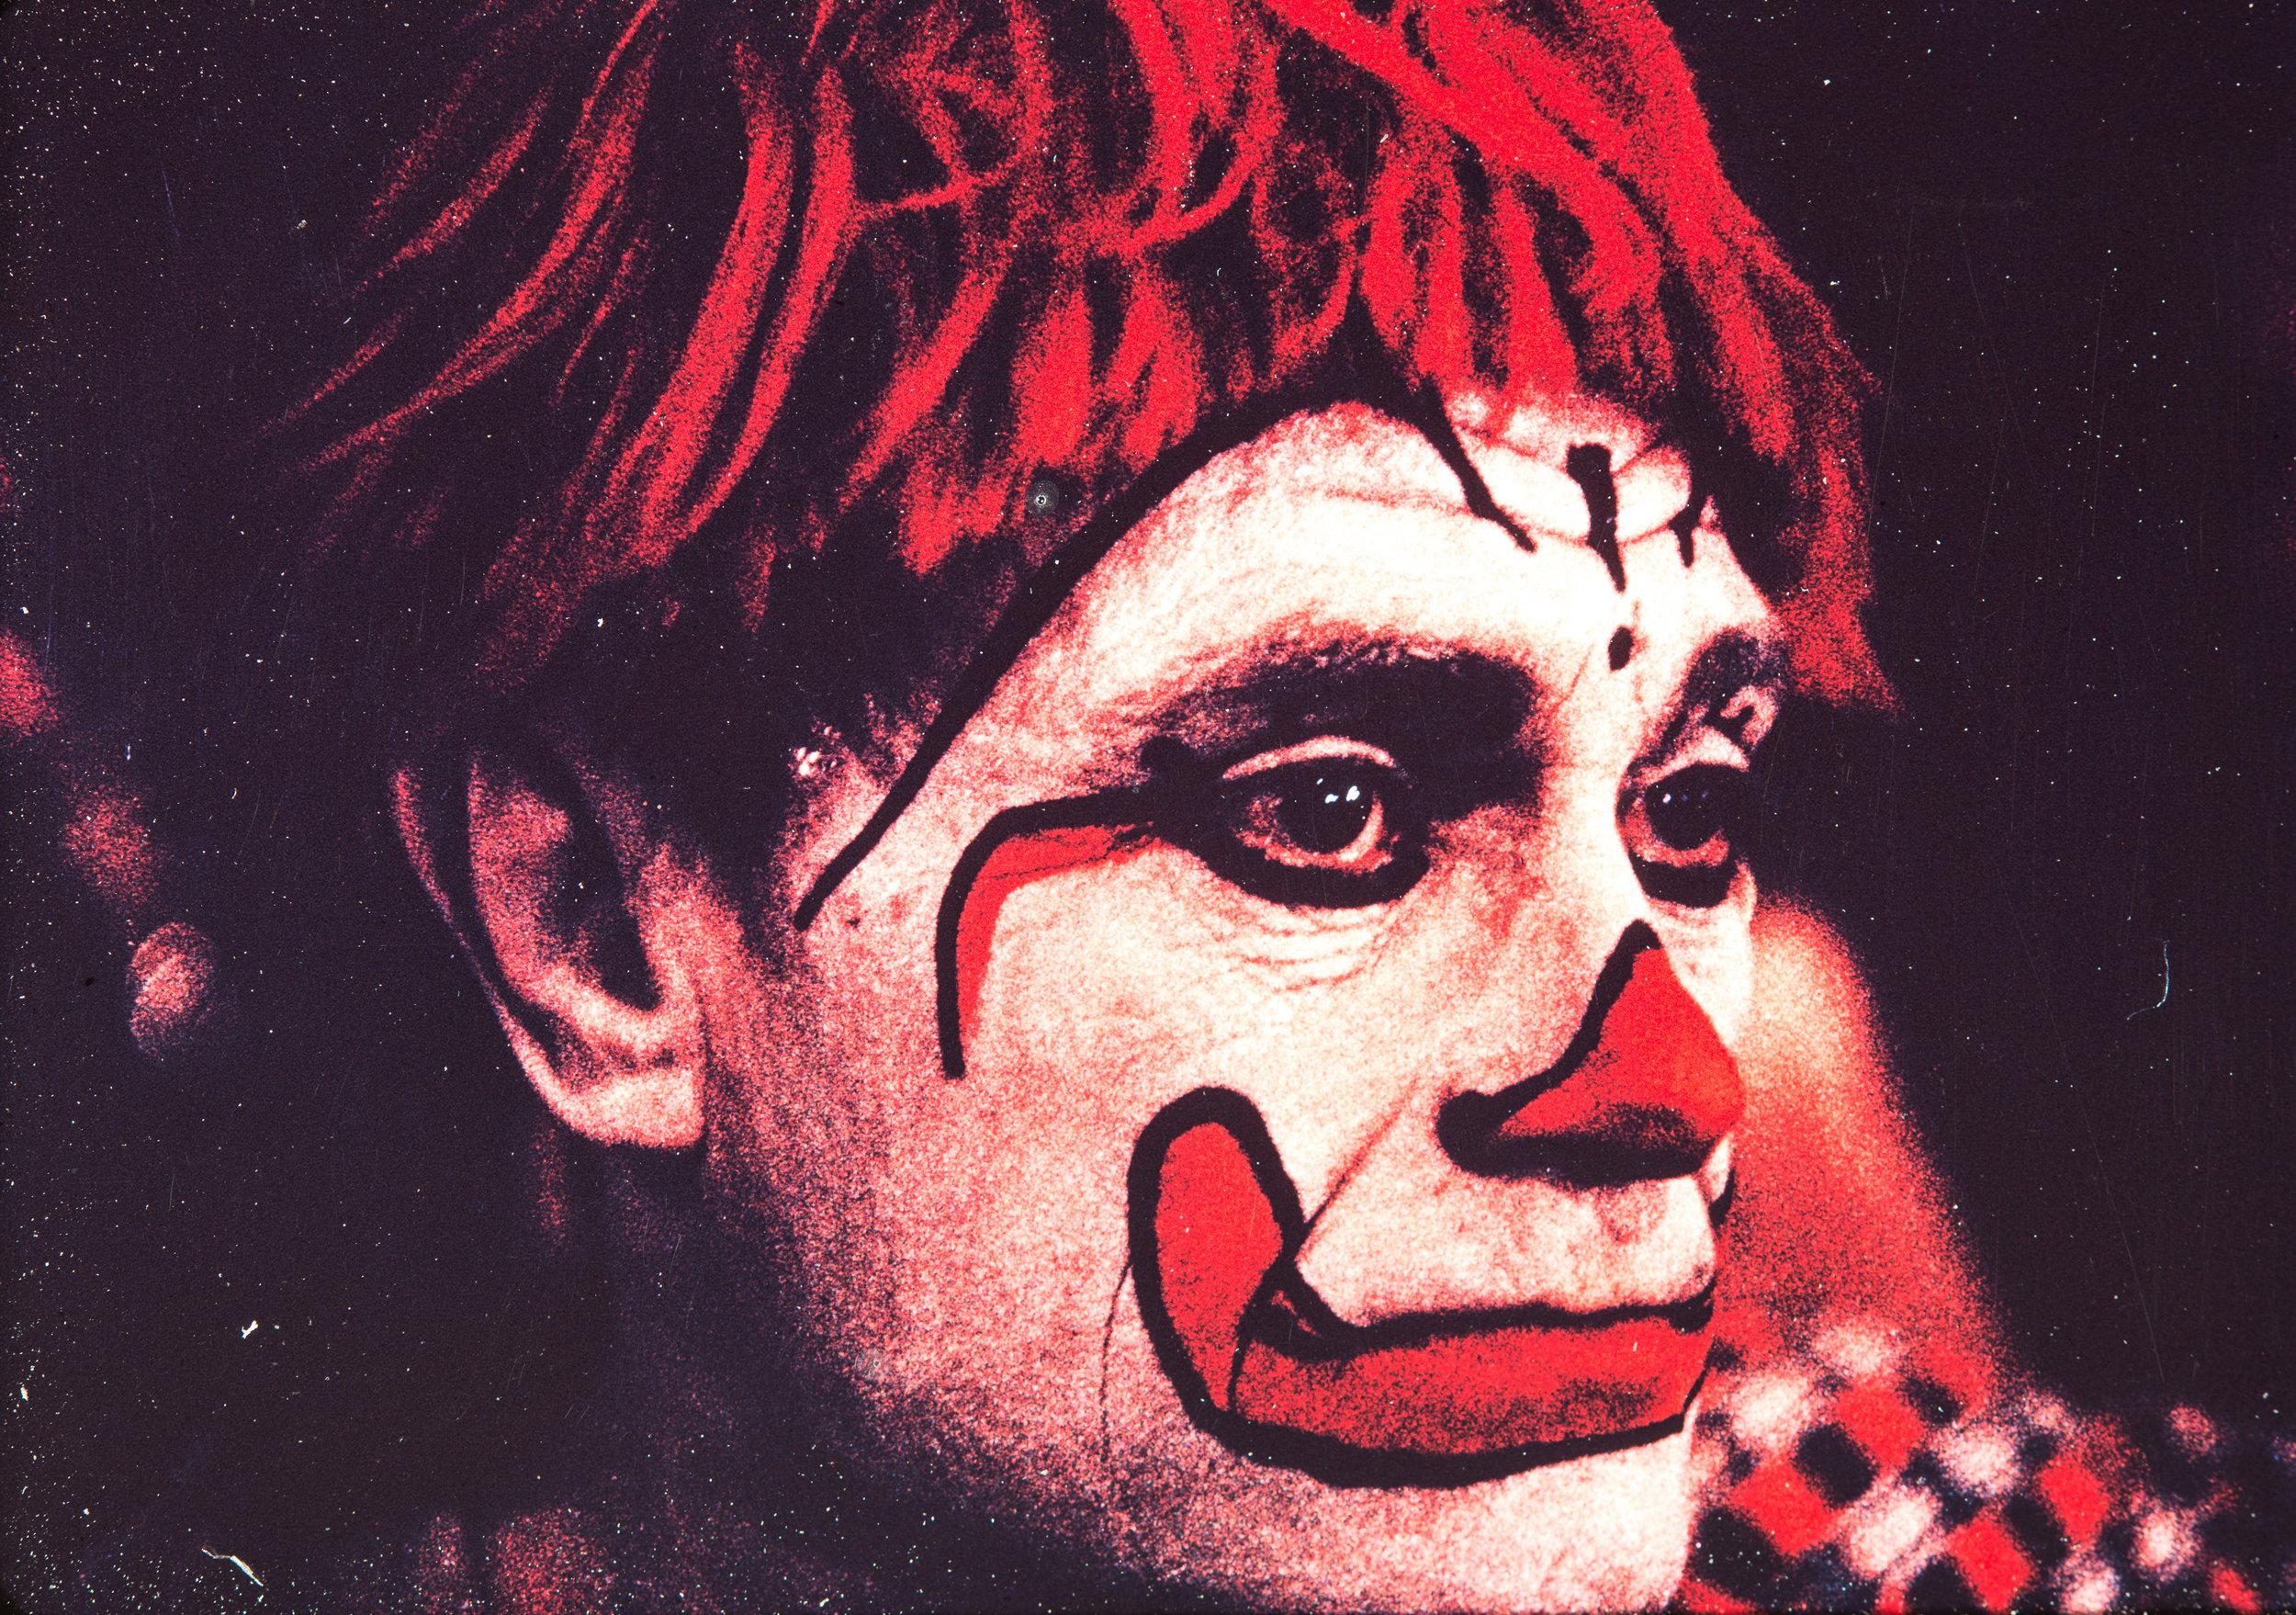 Clown portrait #2, NYC, 1959